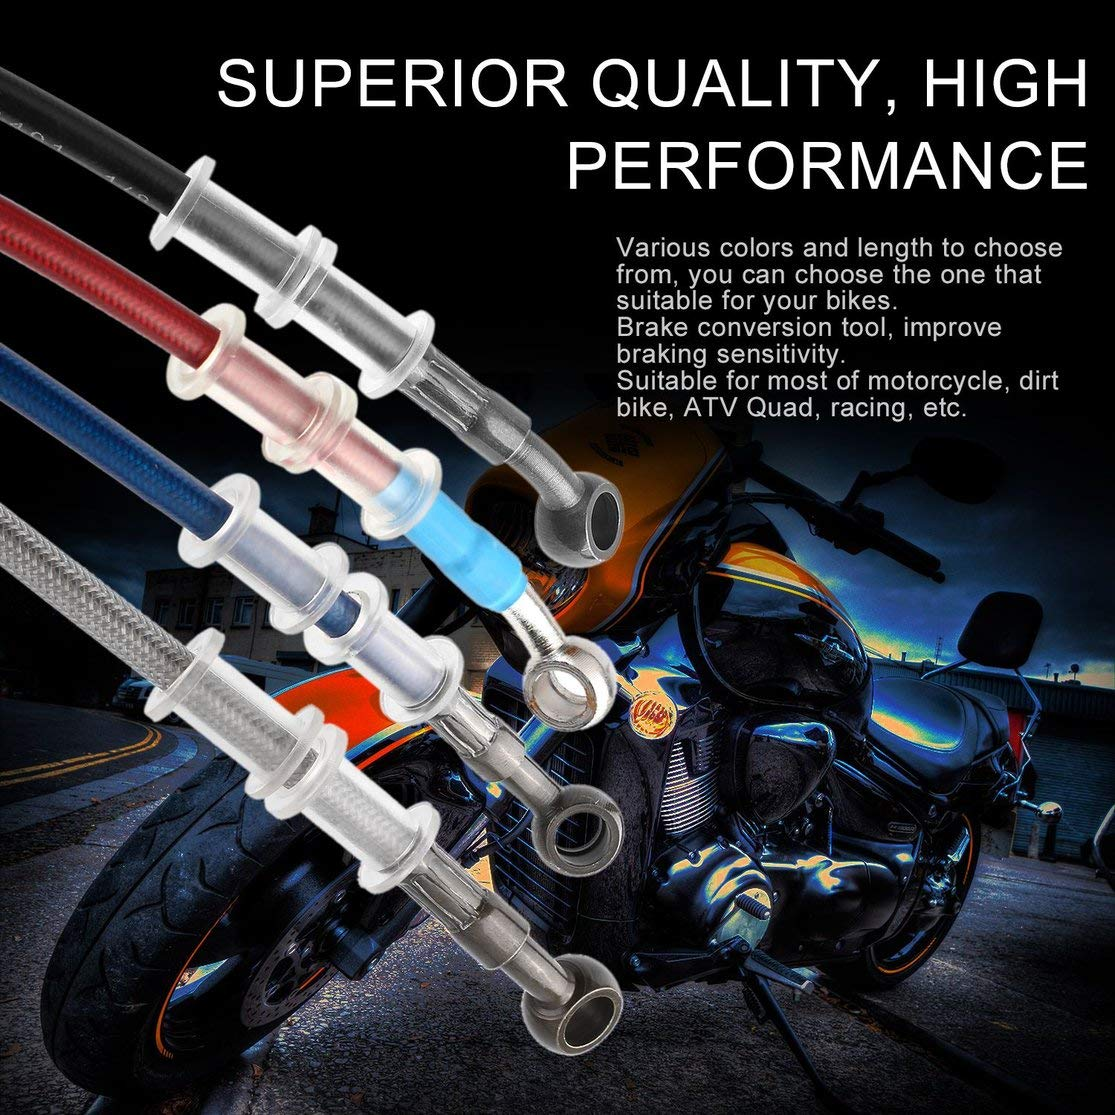 Color:Black Universal Motorcycle Brake Pipe Braided Steel Hydraulic Reinforce Brake Clutch Oil Hose Line Pipe Tube for Racing Dirt Bike 120cm